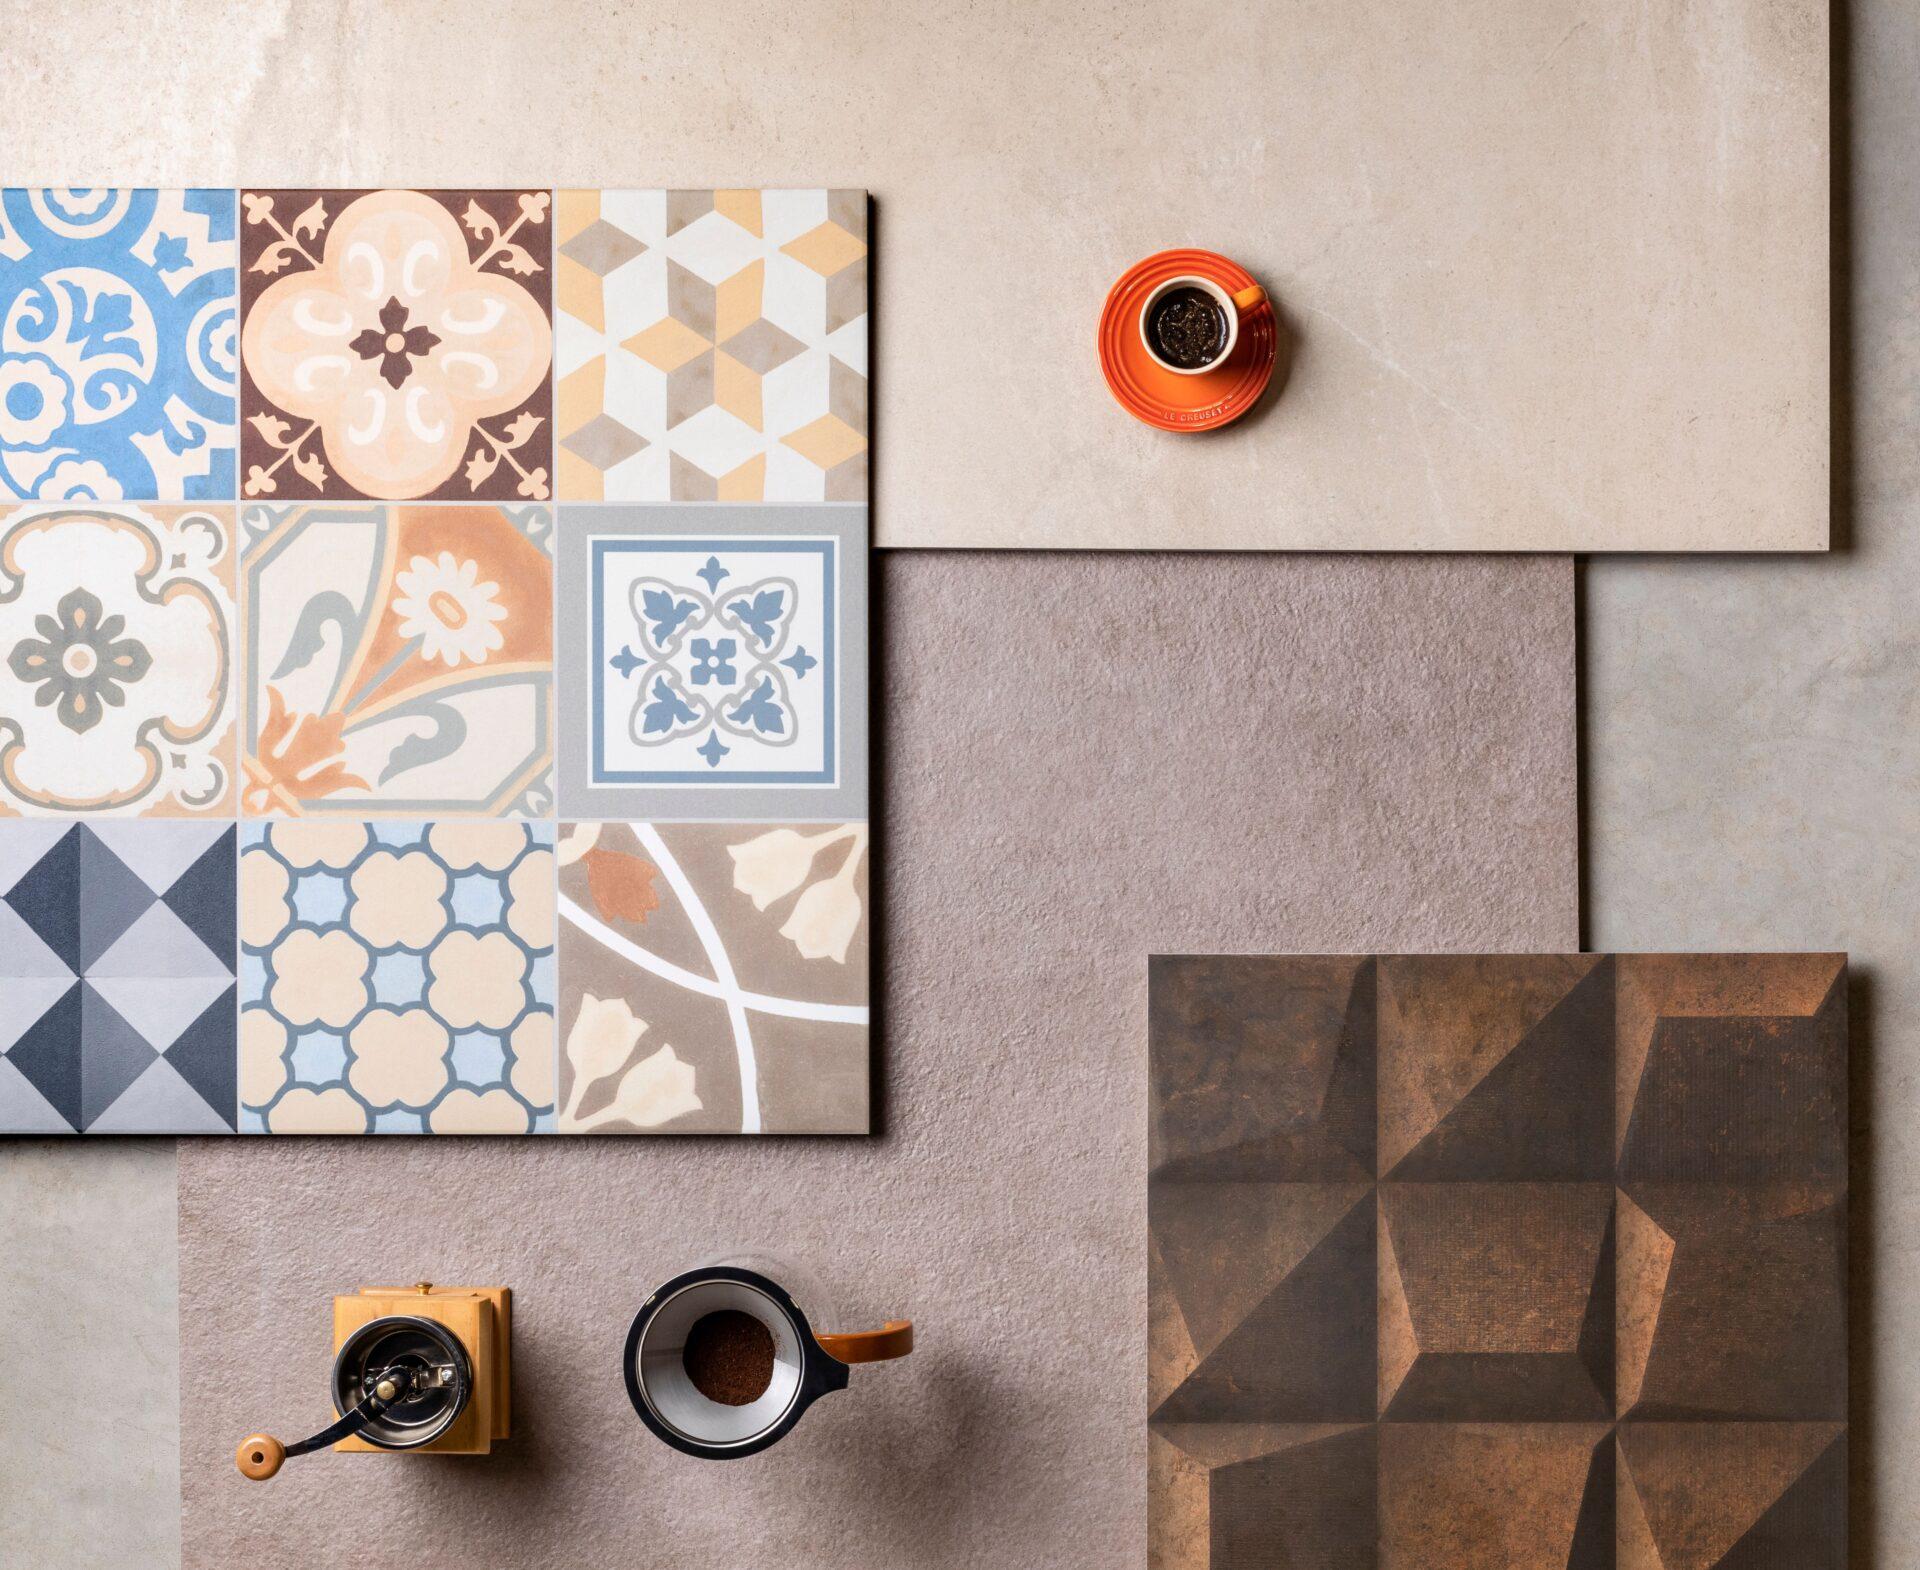 Rodin Shadow Corten Ma 45x90cm | Essence Decor AC 60x60cm | Brera Terra EXT 90x90cm | Arenaria Bege AC 59×118,2cm